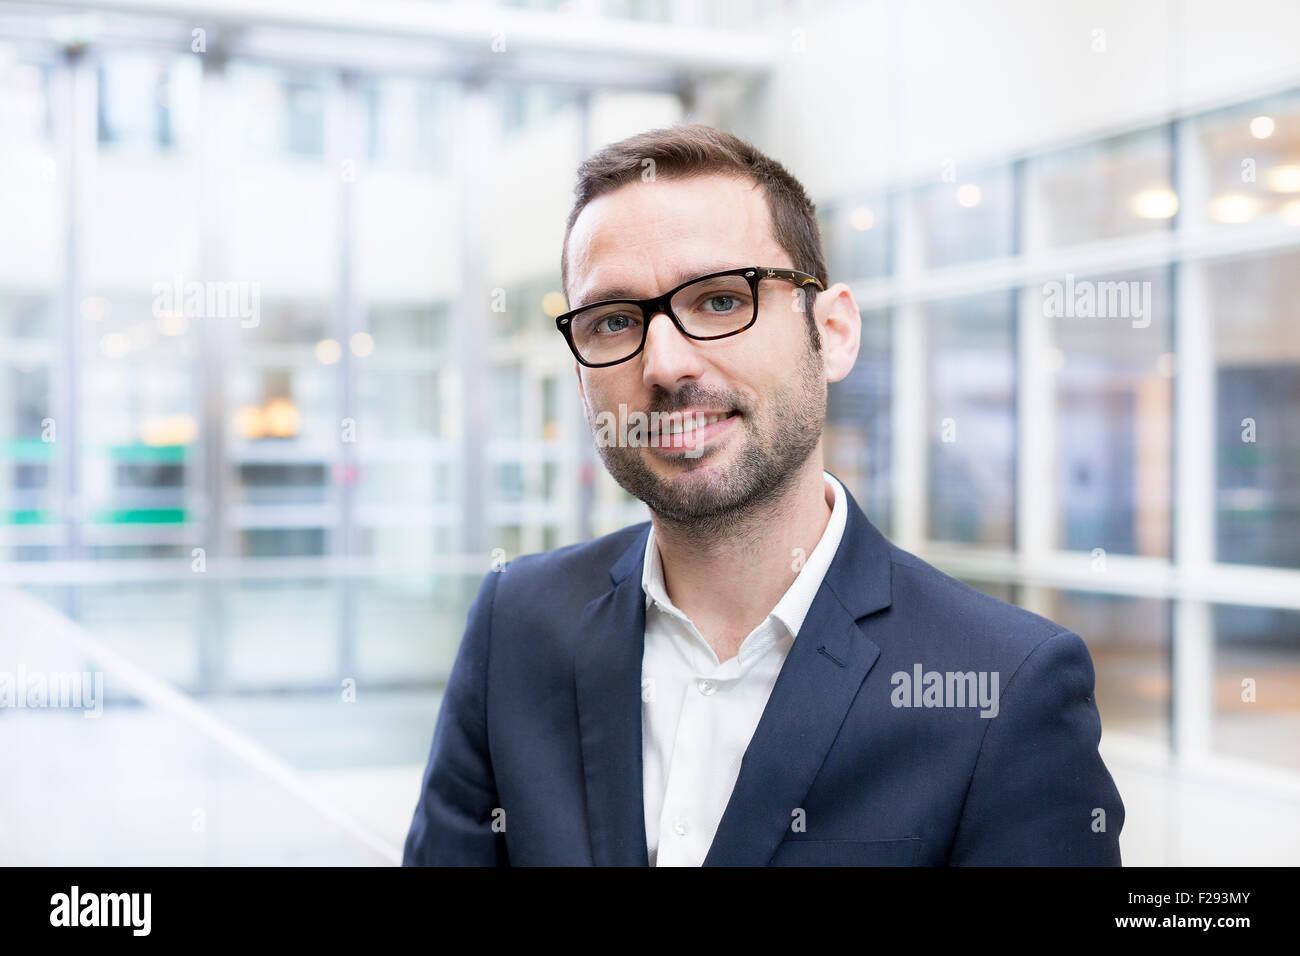 Retrato de un hombre de negocios Imagen De Stock